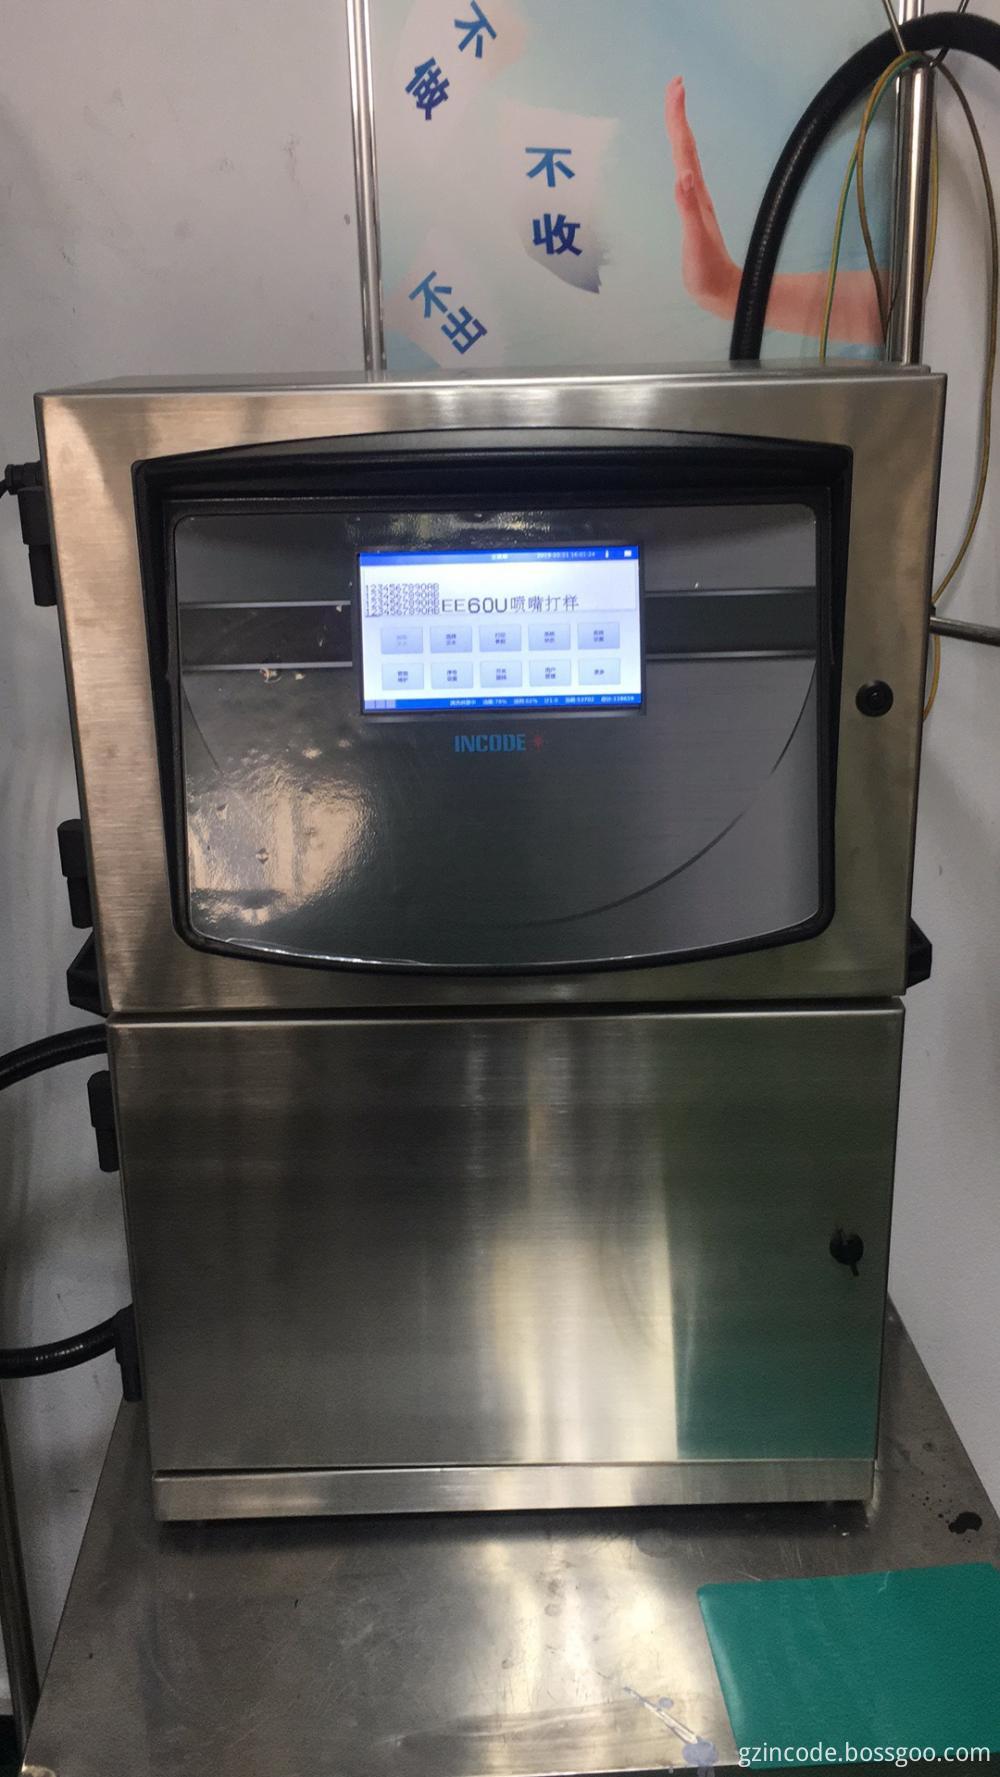 Small Character Inkjet Printer